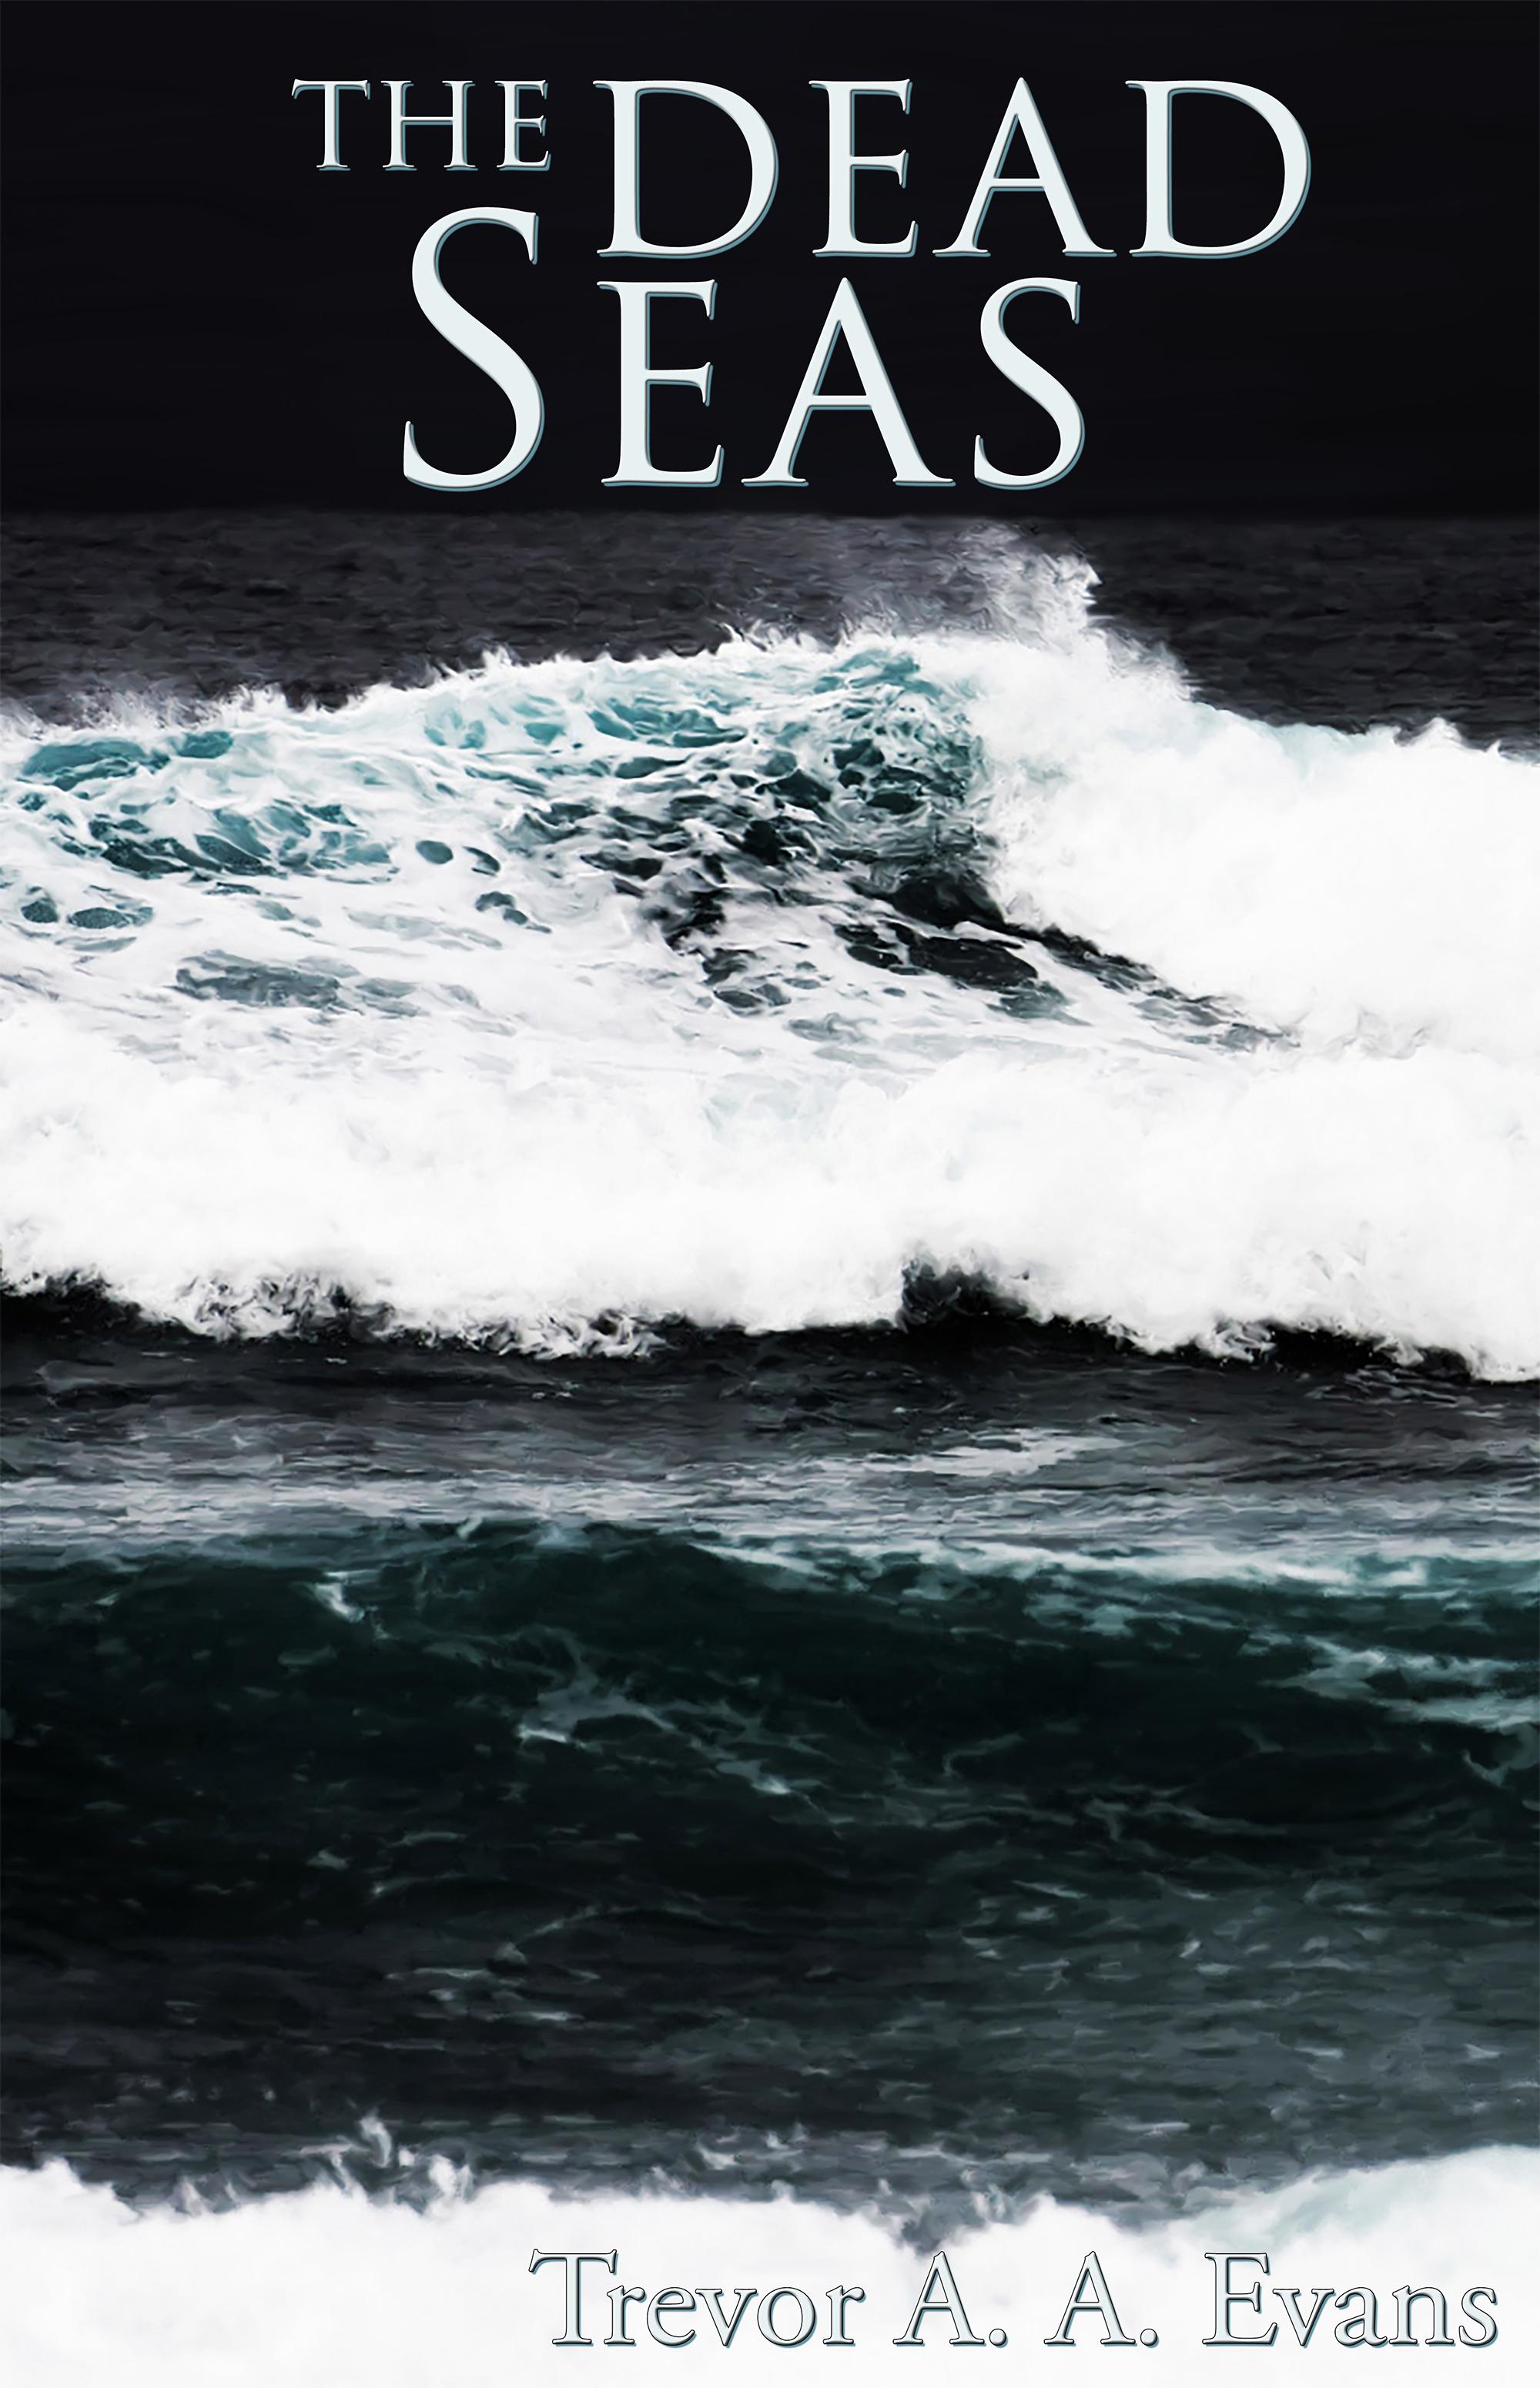 The Dead Seas Trevor A.A. Evans